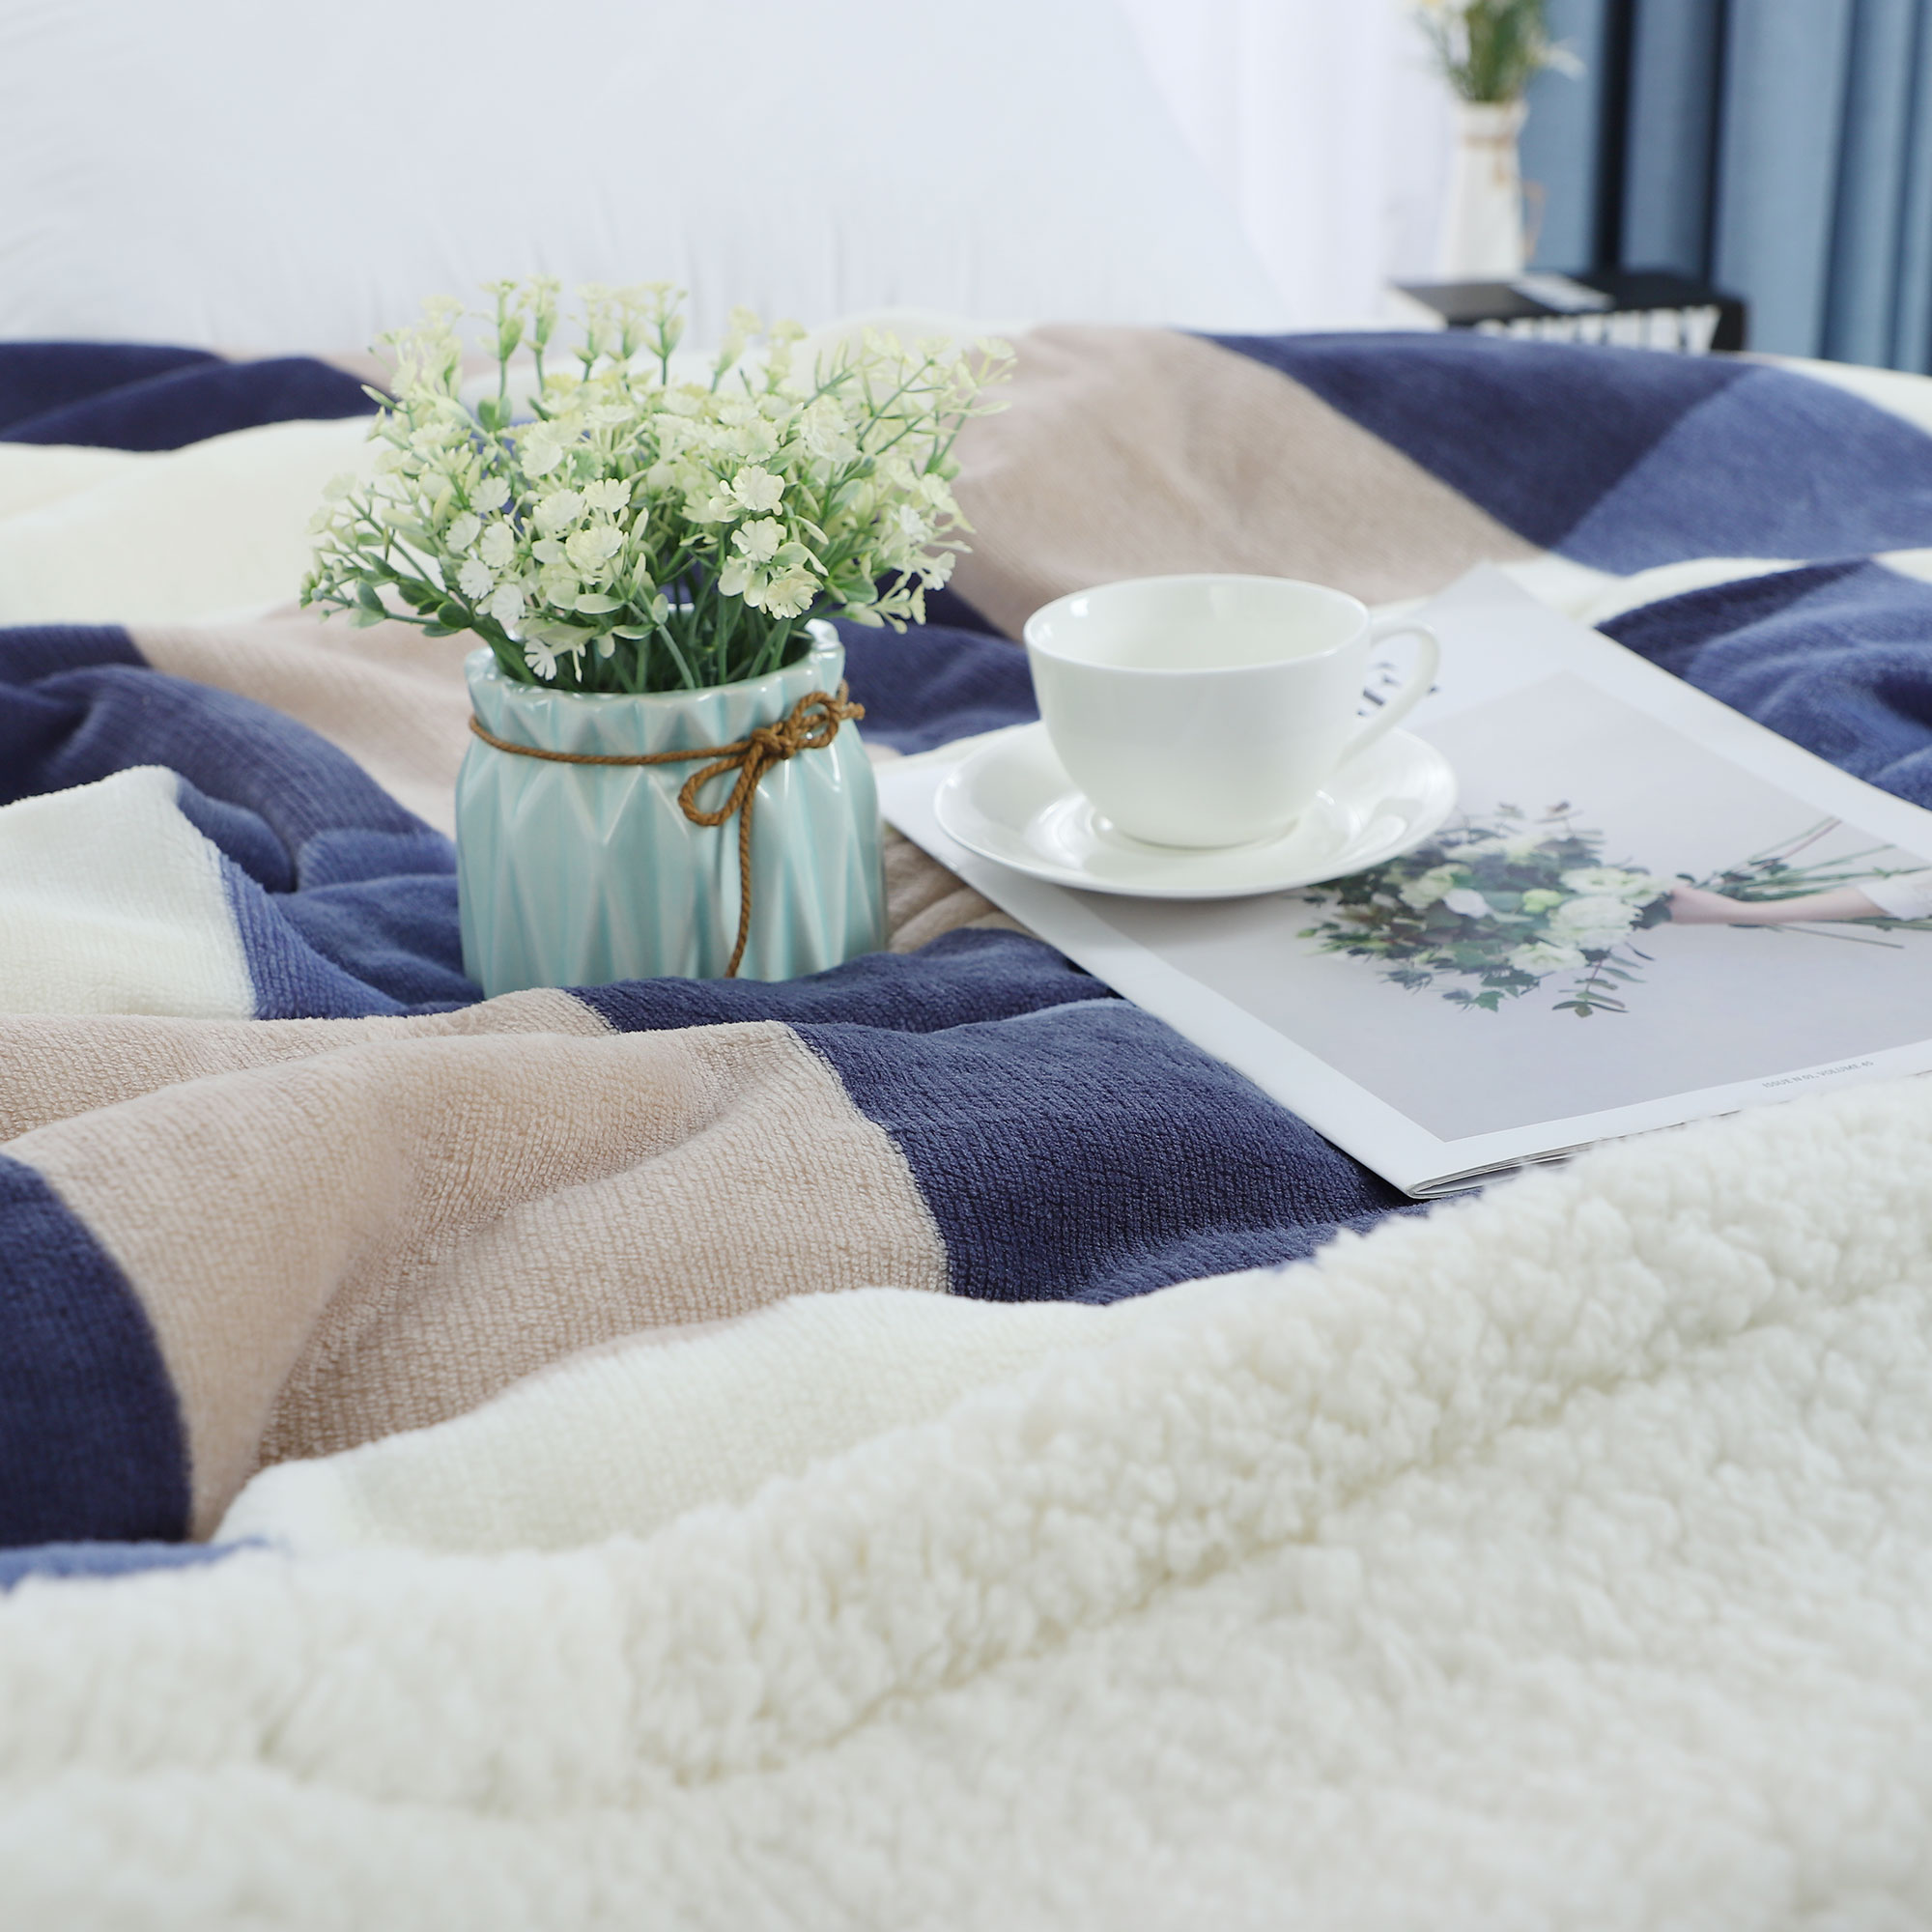 "Soft Faux Lambswool Blanket Reversible Plaid Pattern Bed Blanket Full 70"" x 78"" - image 3 de 8"